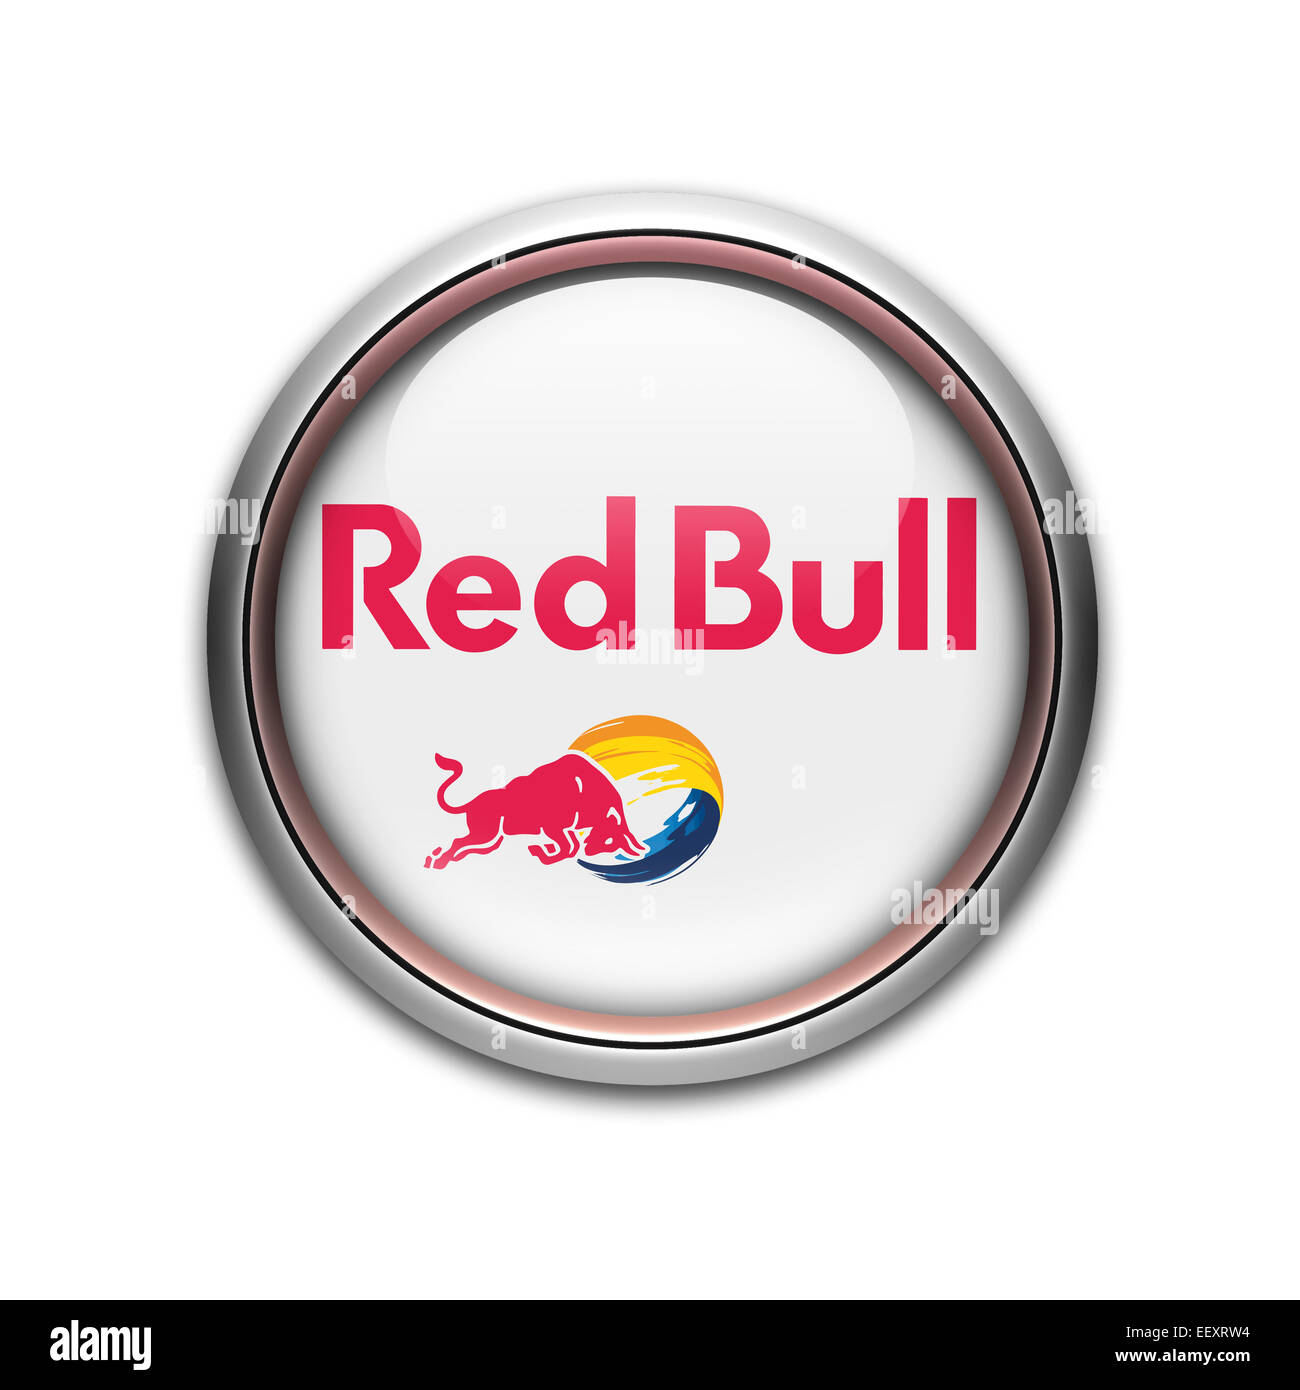 red bull redbull logo icon symbol emblem flag stock photo 78036144